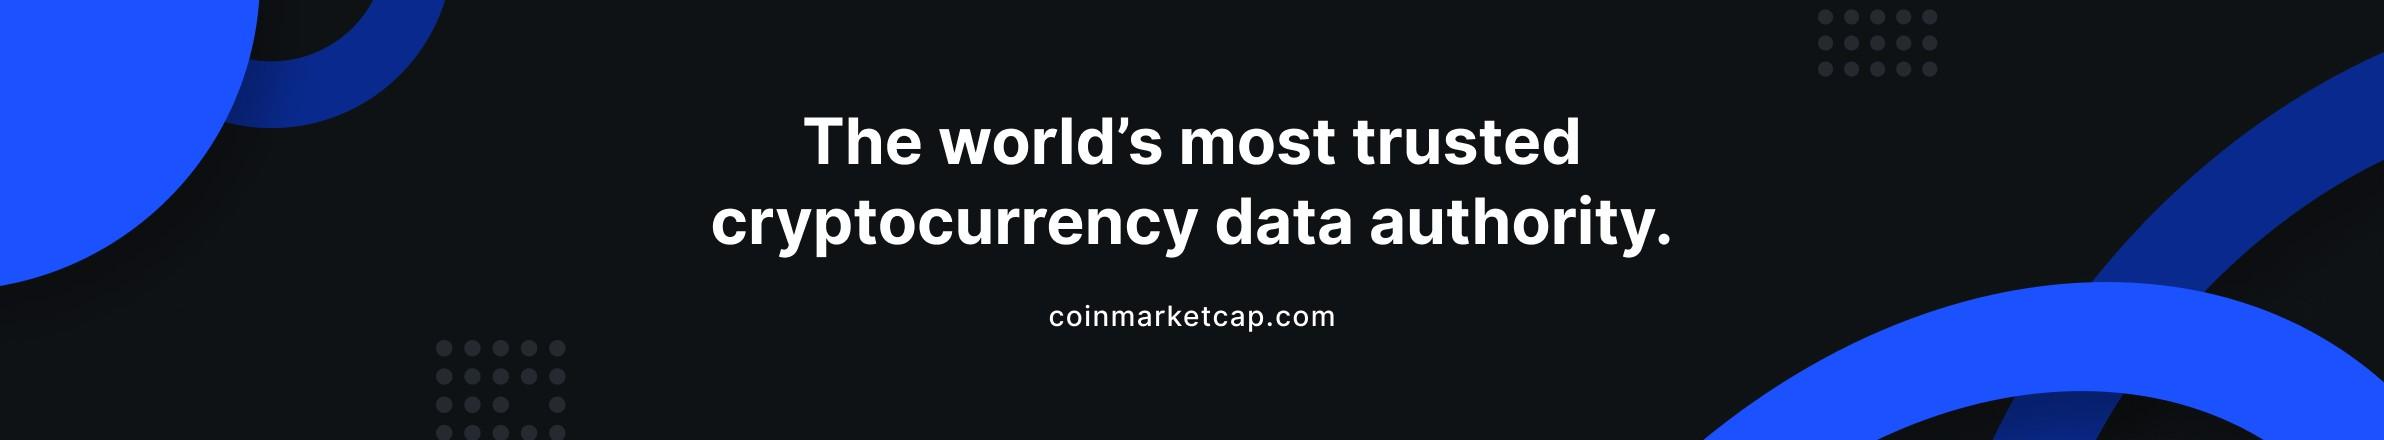 coinmarketcap similar websites